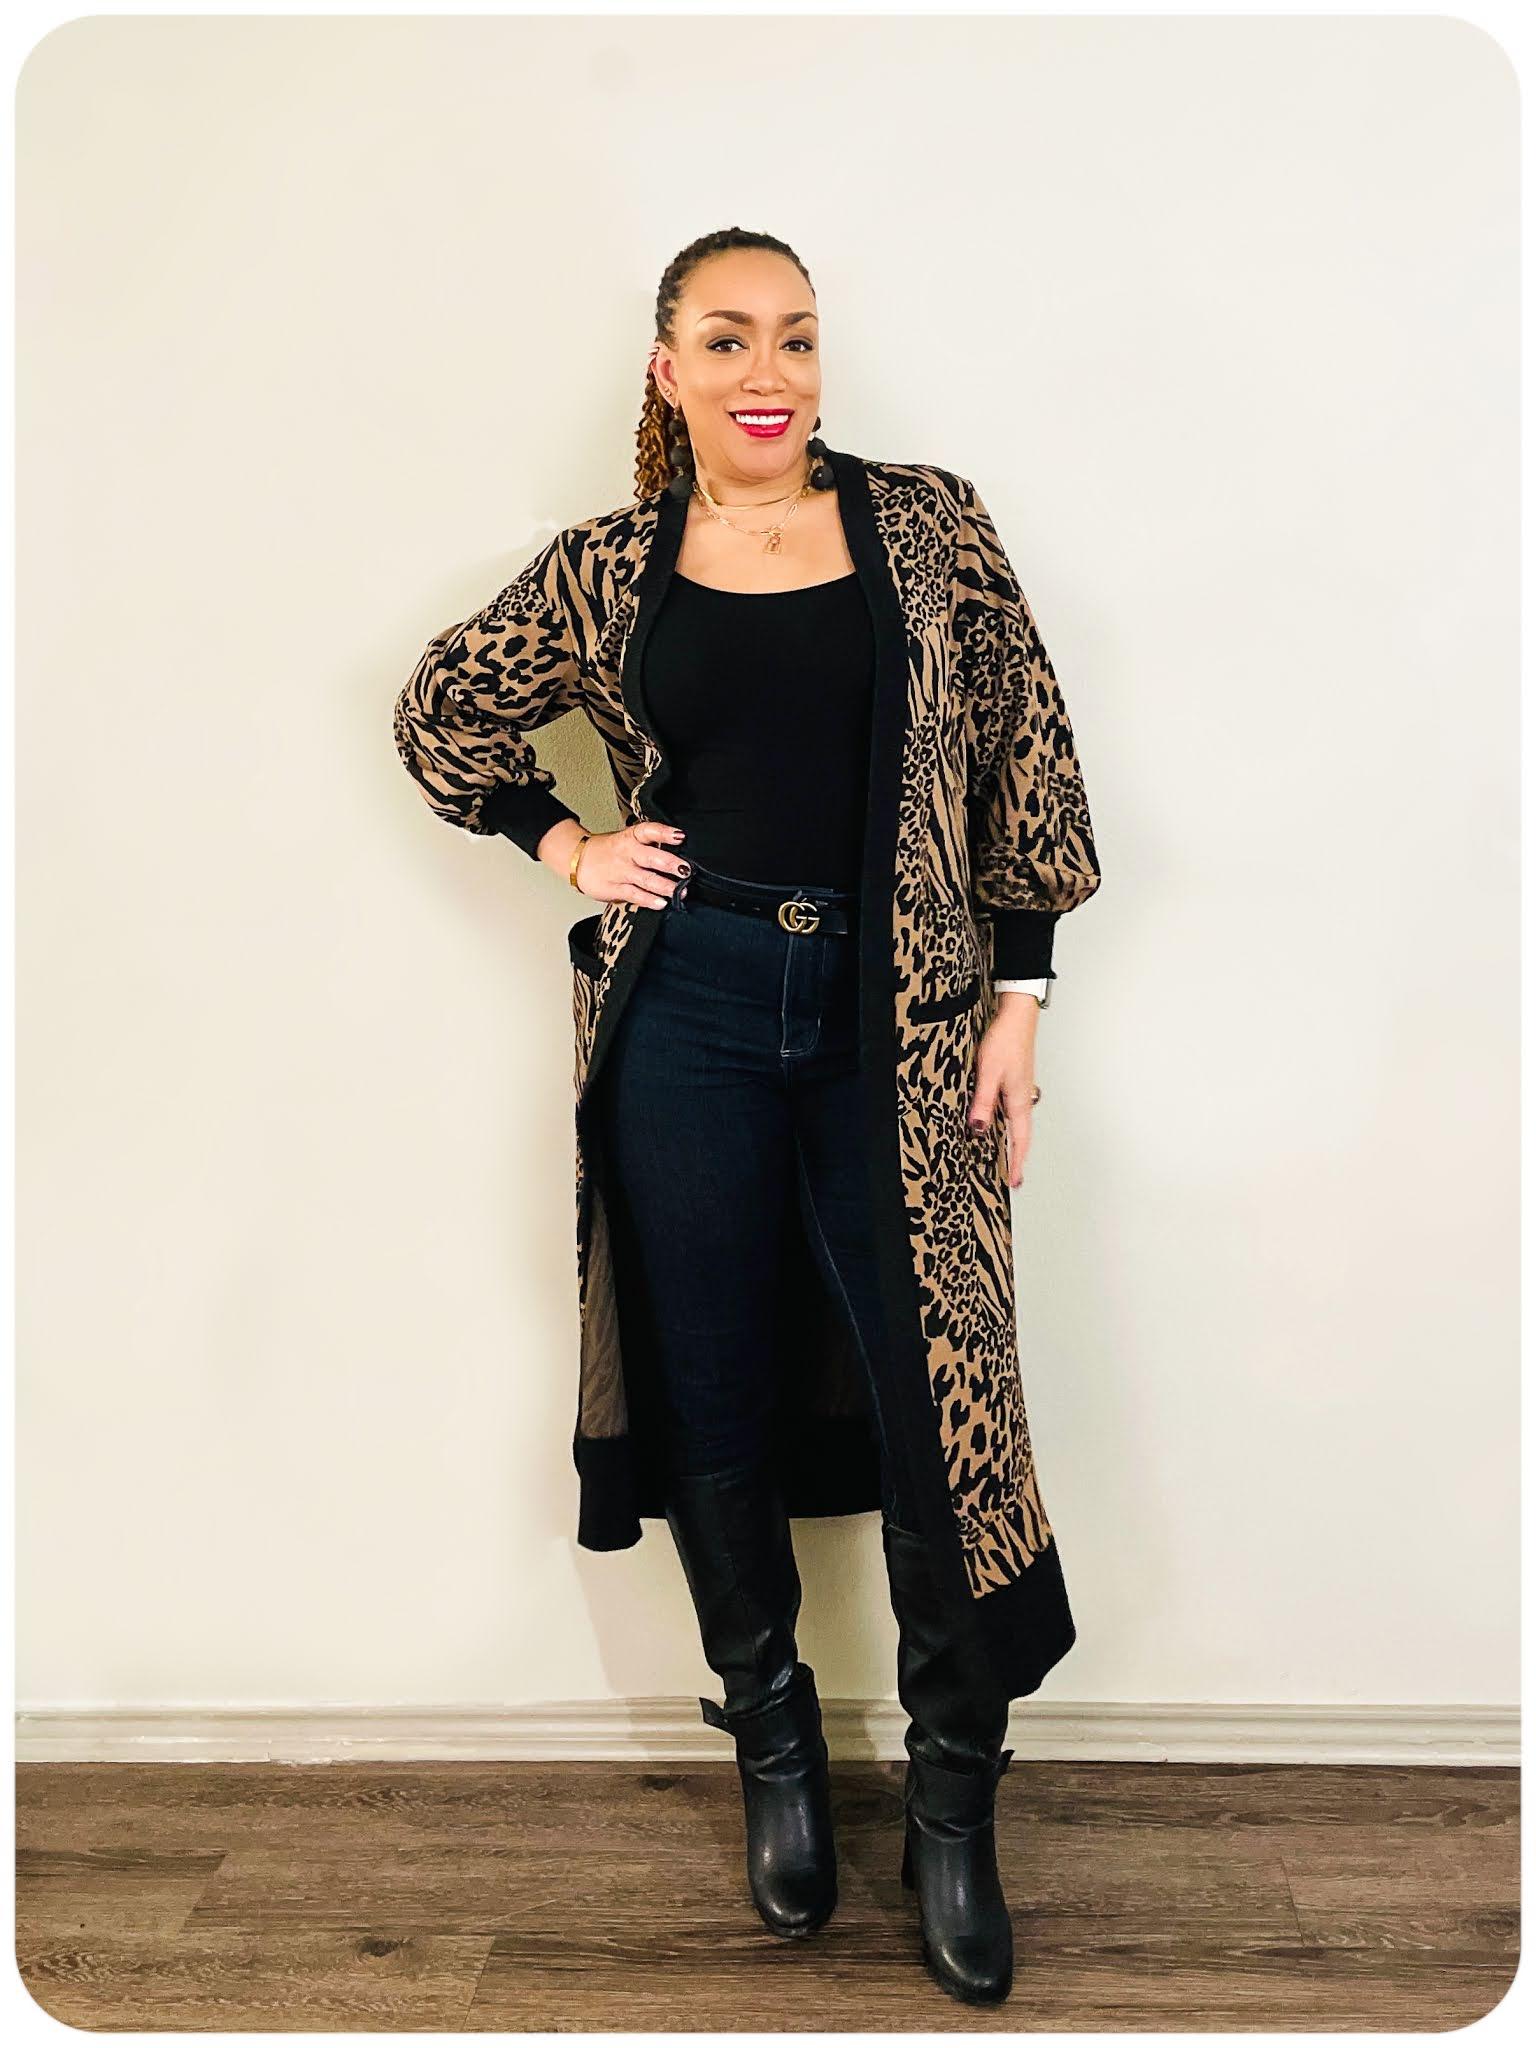 Mixed Animal Print Cardigan - Erica Bunker DIY Style x Zelouf Fabrics